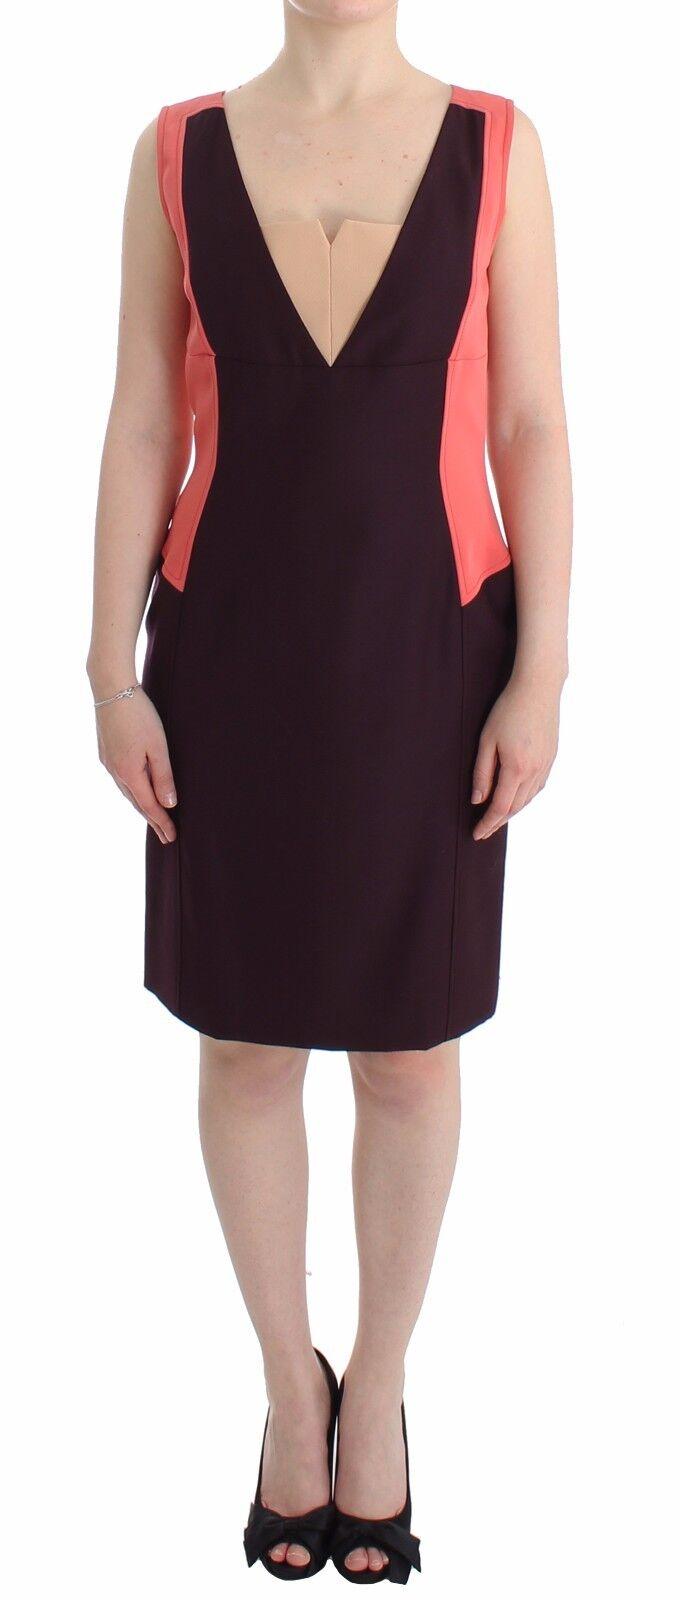 NEW  COTE Dress lila Orange Pencil Wiggle Shift Sheath s. IT44   US10   L